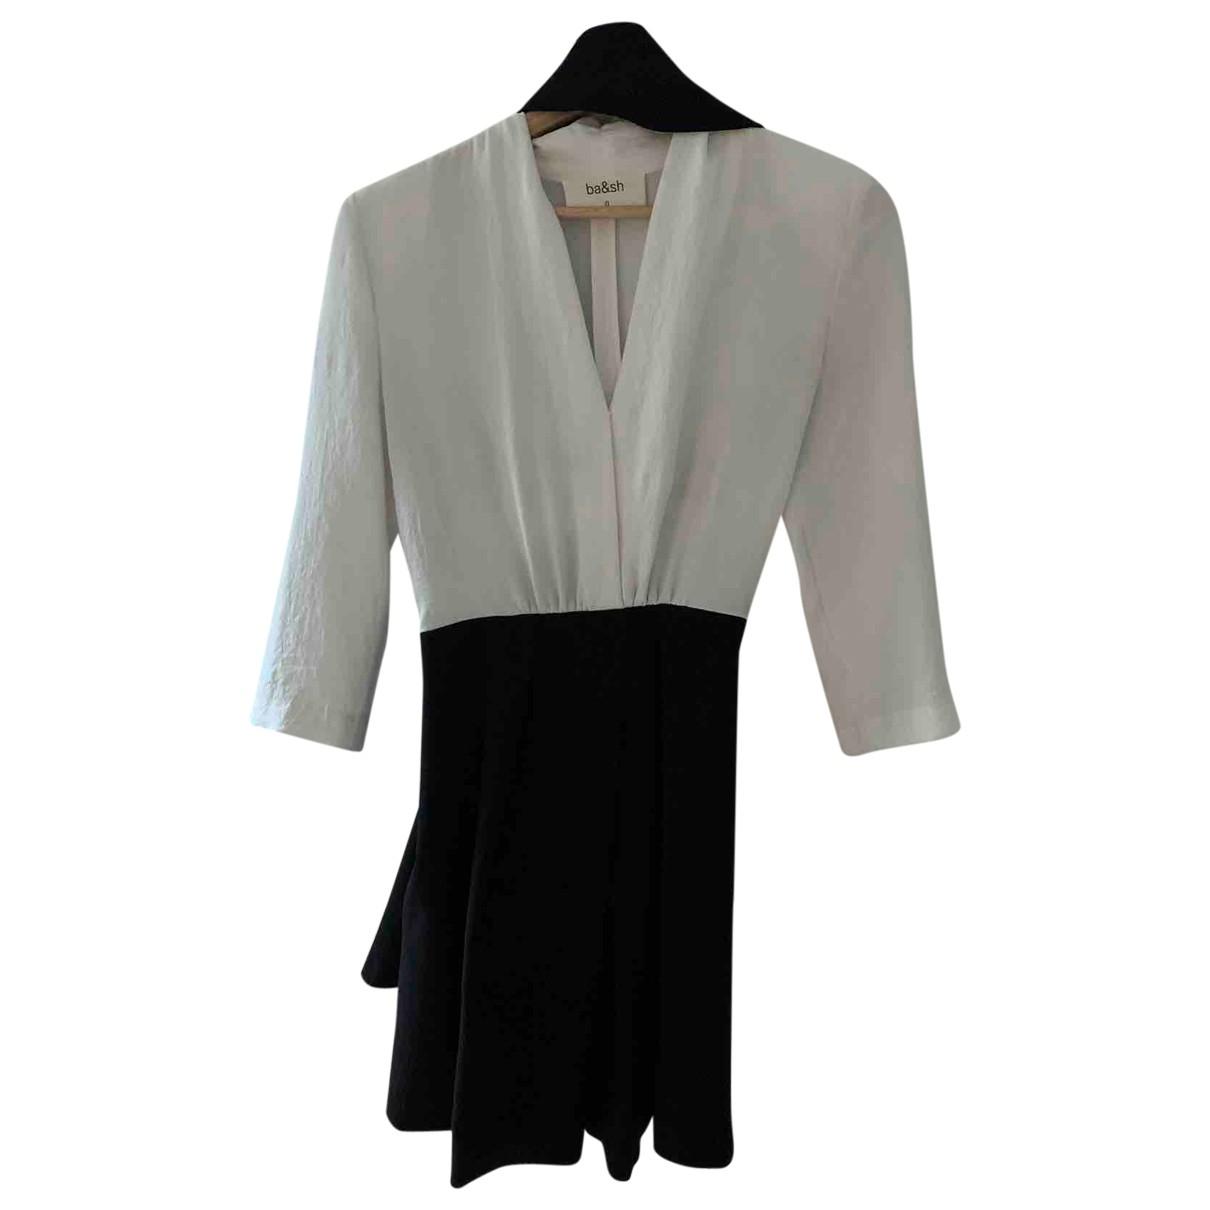 Ba&sh Fall Winter 2019 Black dress for Women 34 FR